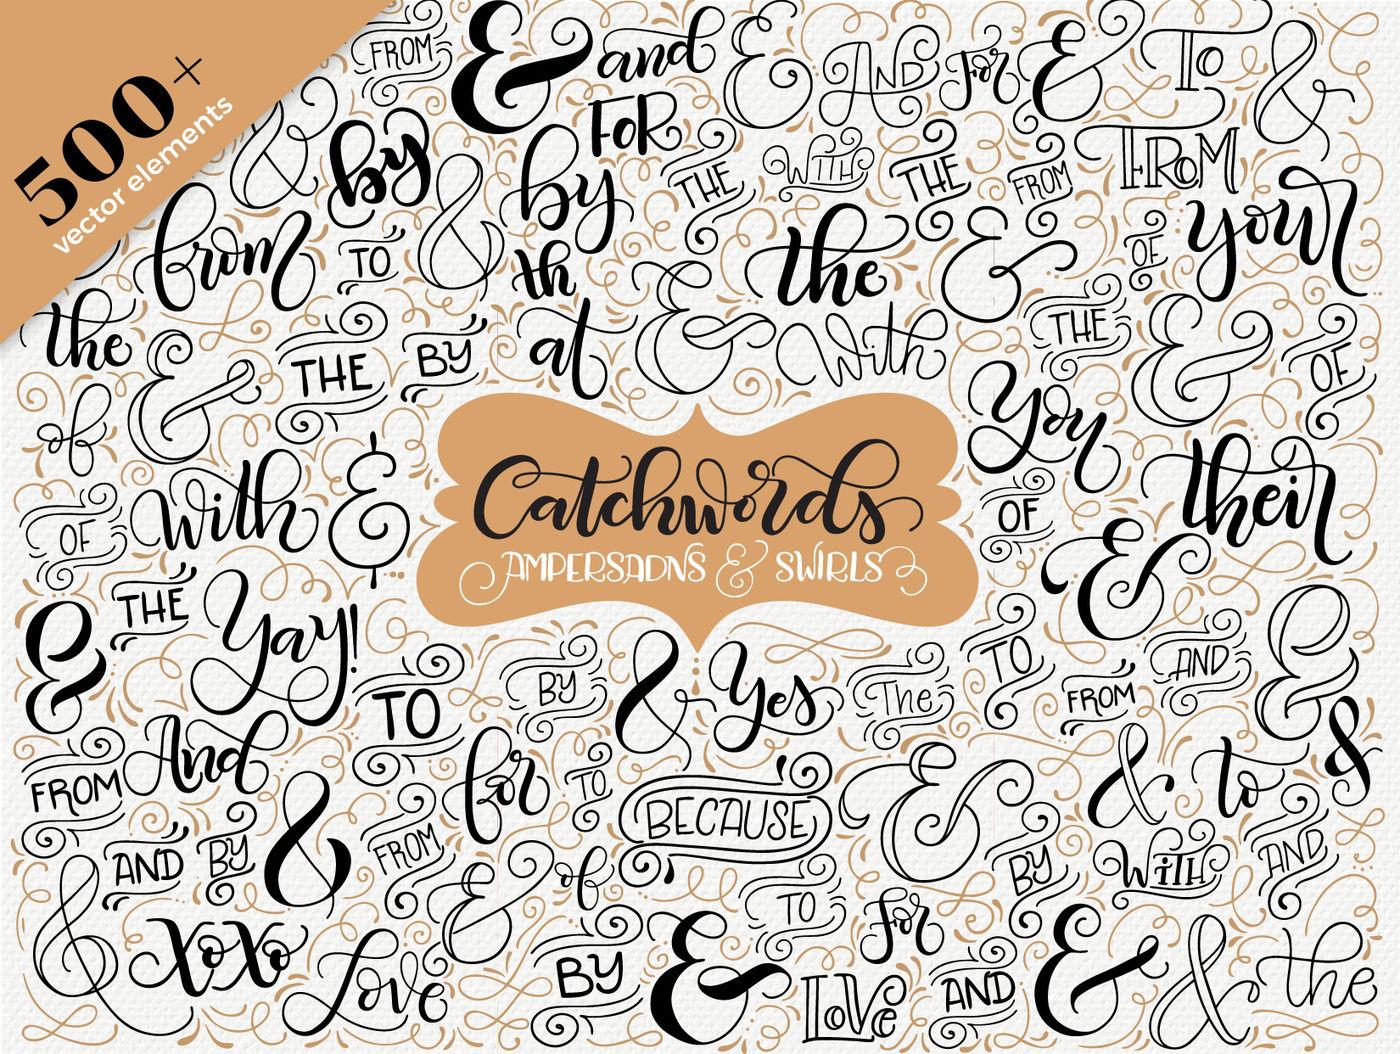 Catchwords Ampersands Swirls Vector Resources By Joy Kelley